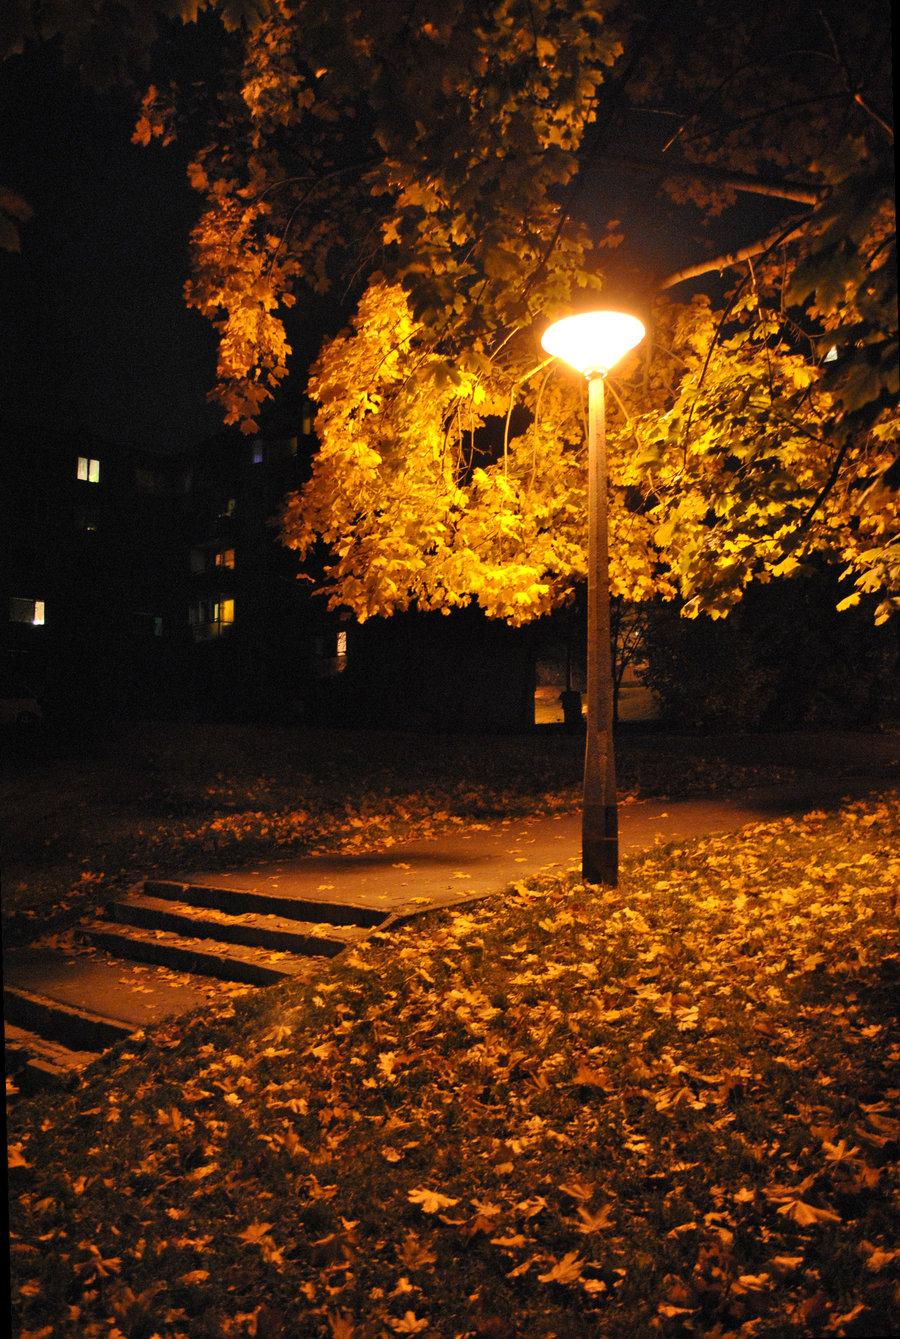 Autumn Night Autumn Posters Picture